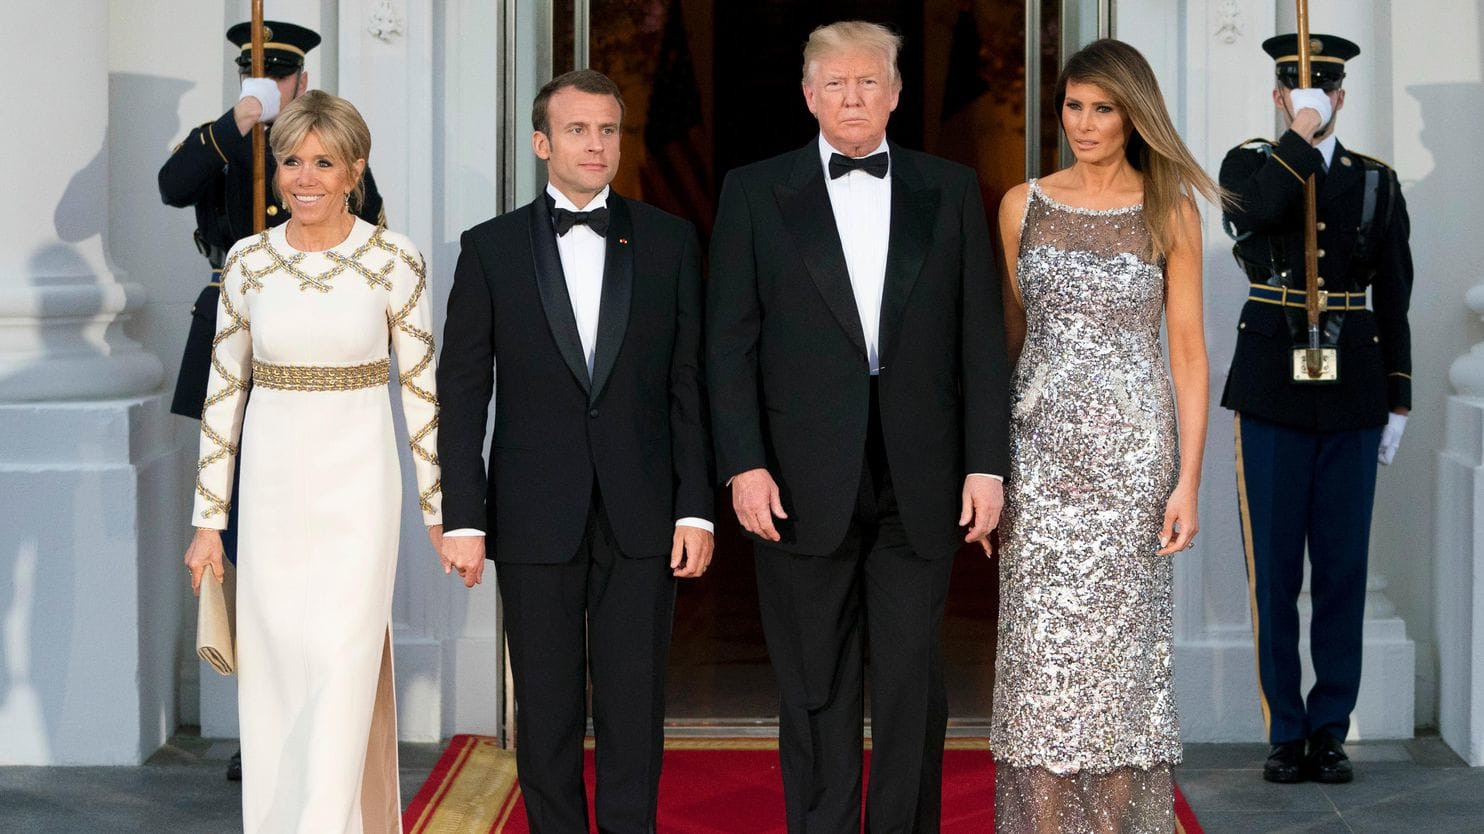 Melania Trump State Dinner  As state dinner hostess Melania Trump finally seems at